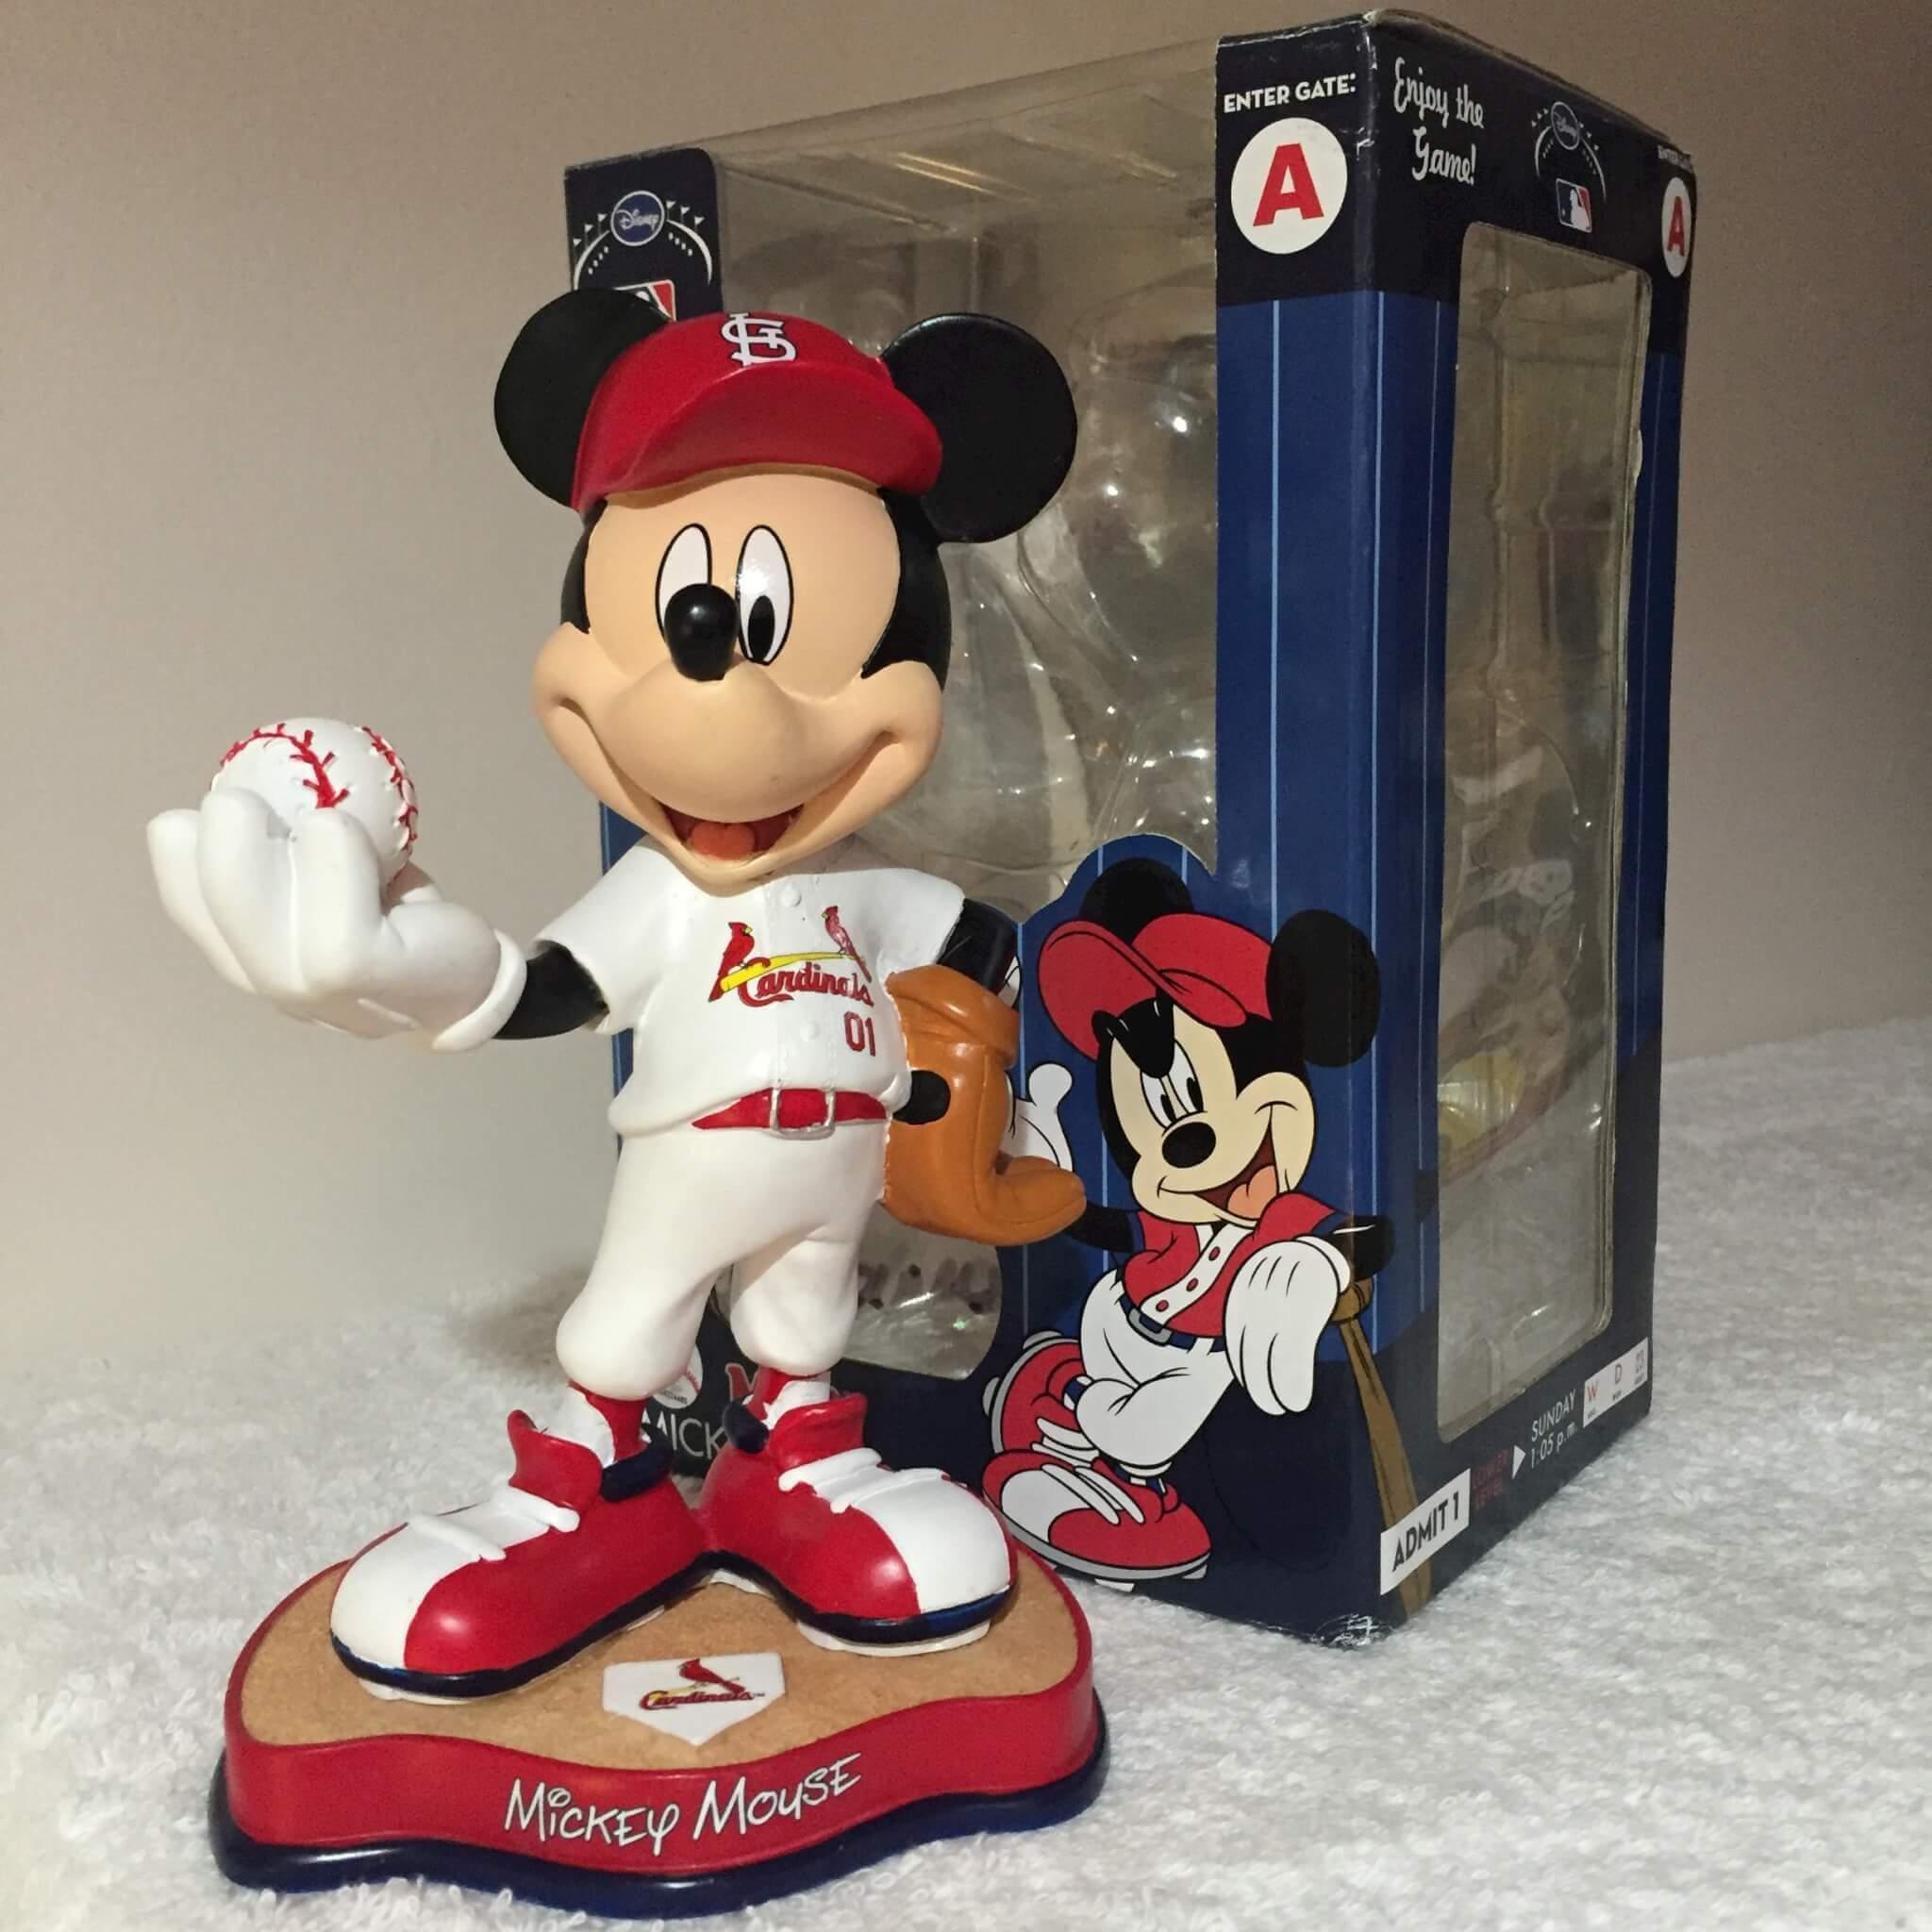 Cardinals Mickey